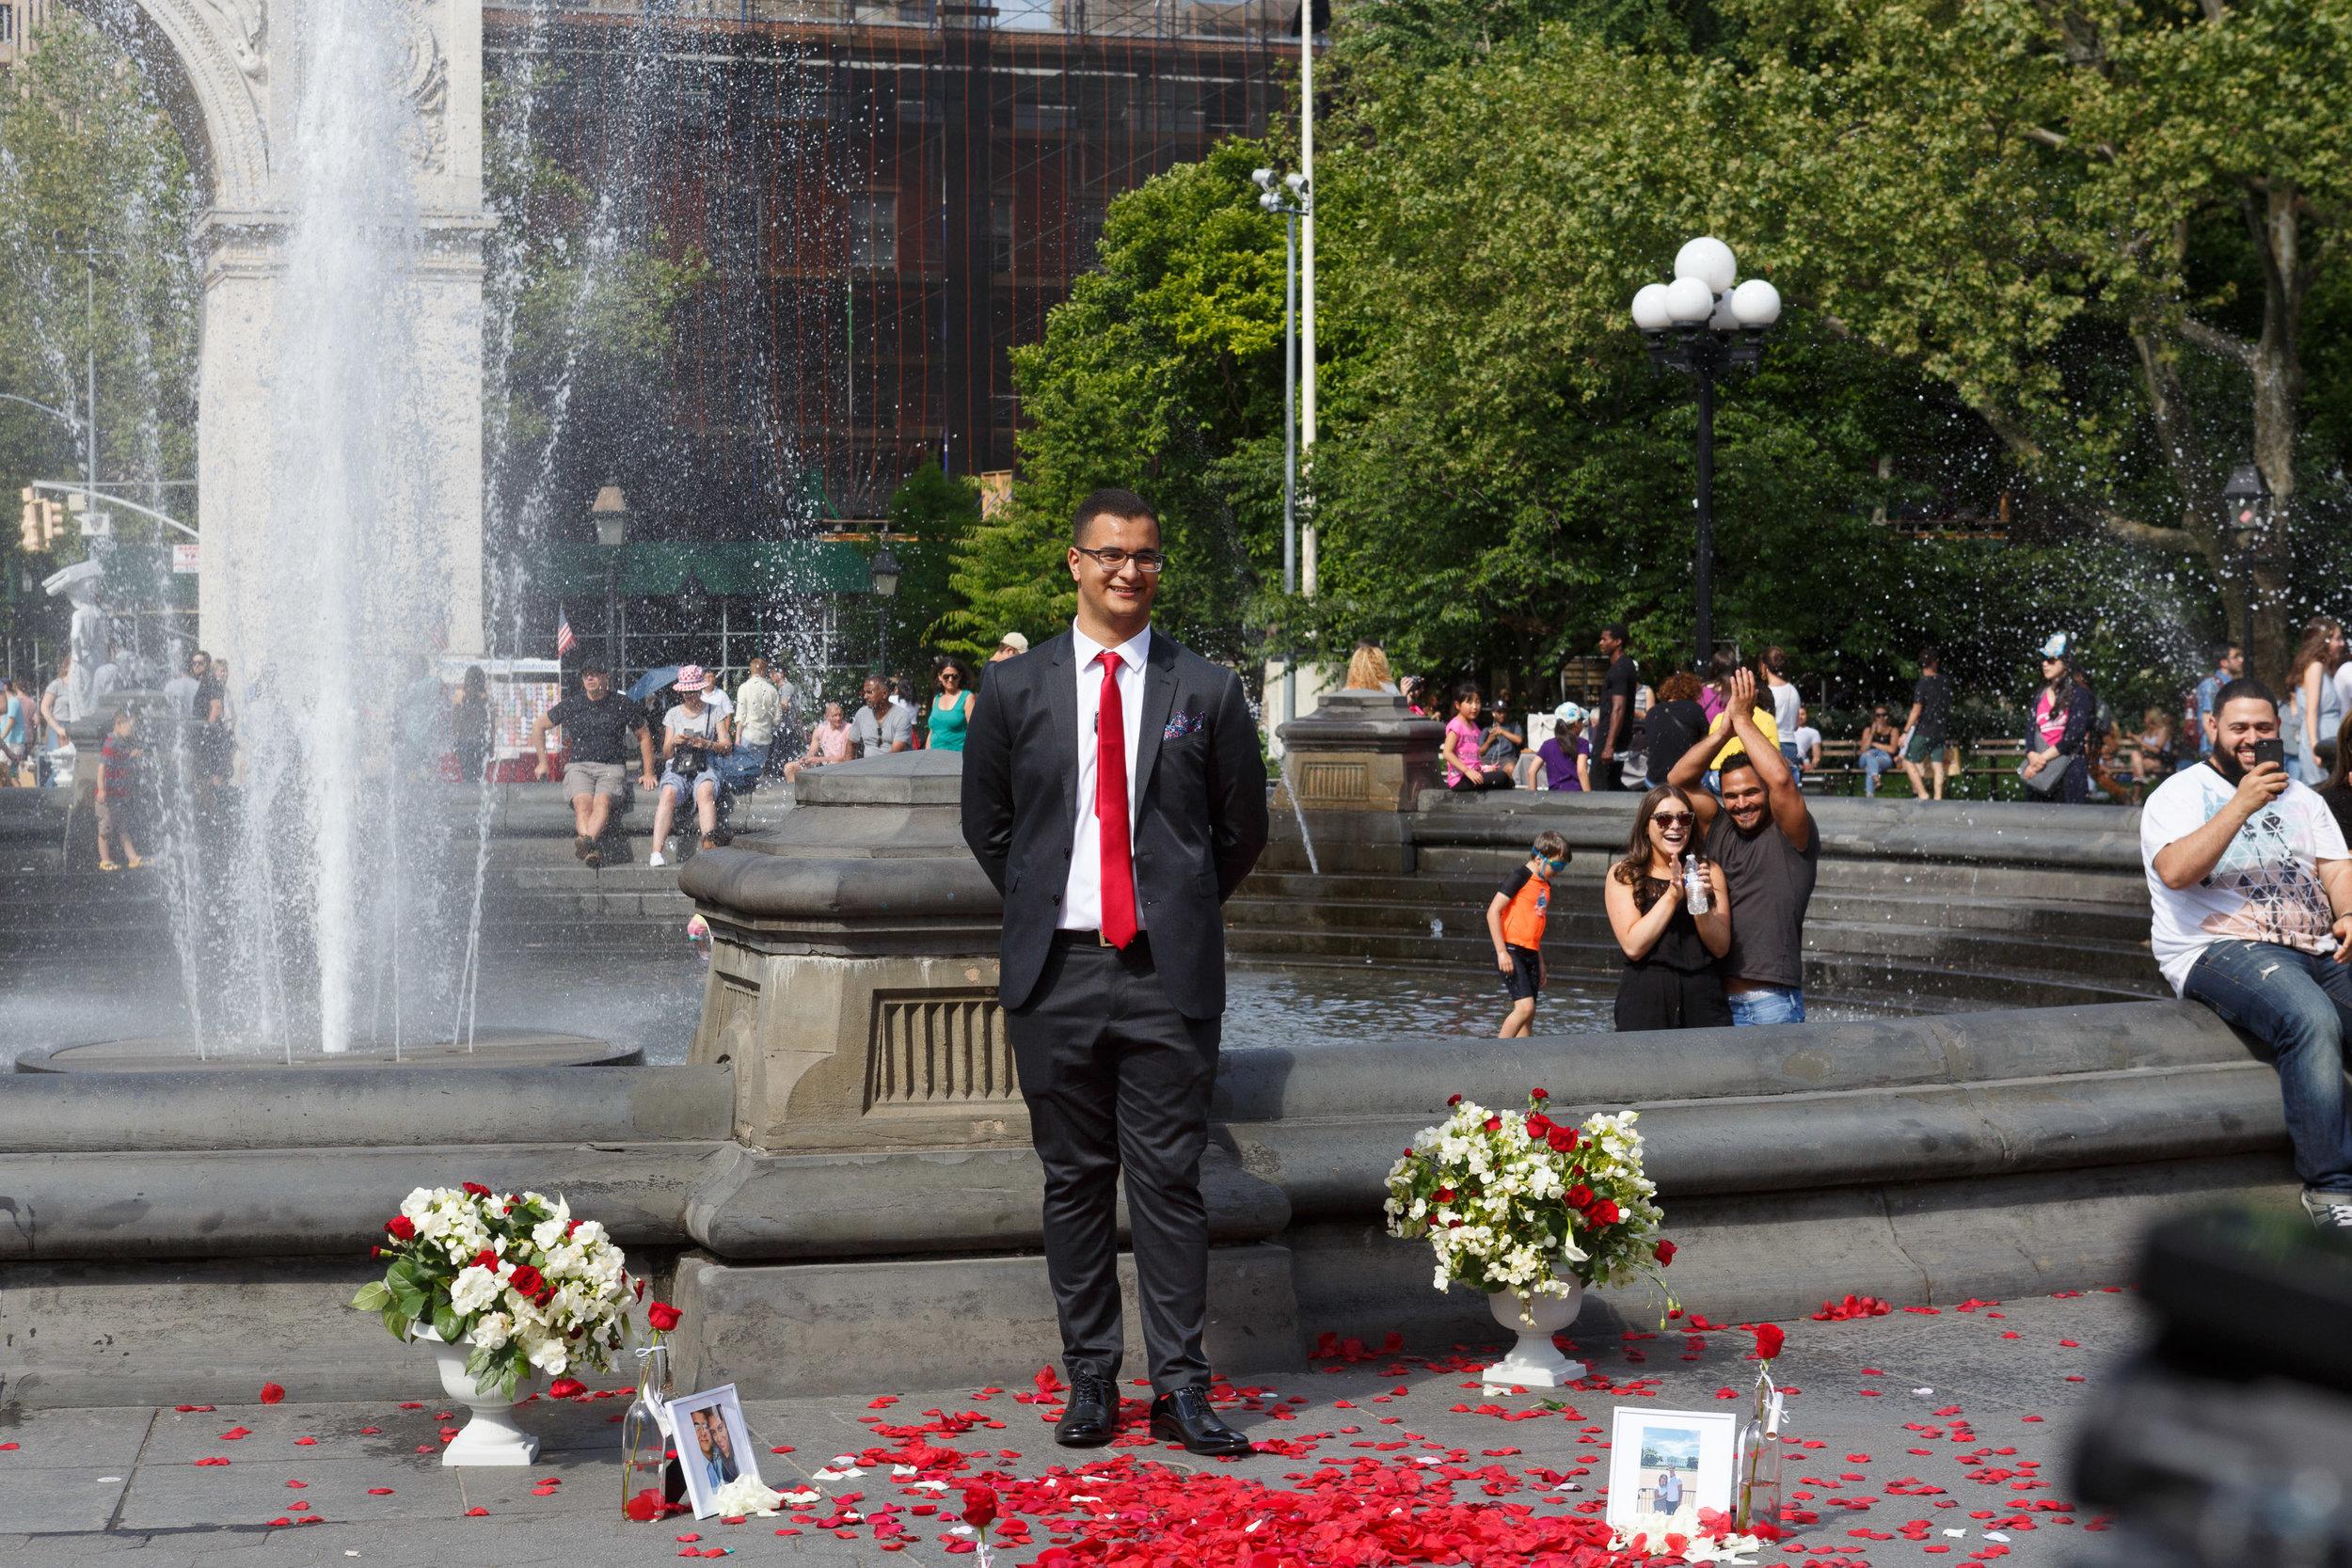 Kiro Rebecca Washington Square Park Marriage Proposal _ Jonathan Heisler _ 6152019 _012.jpg